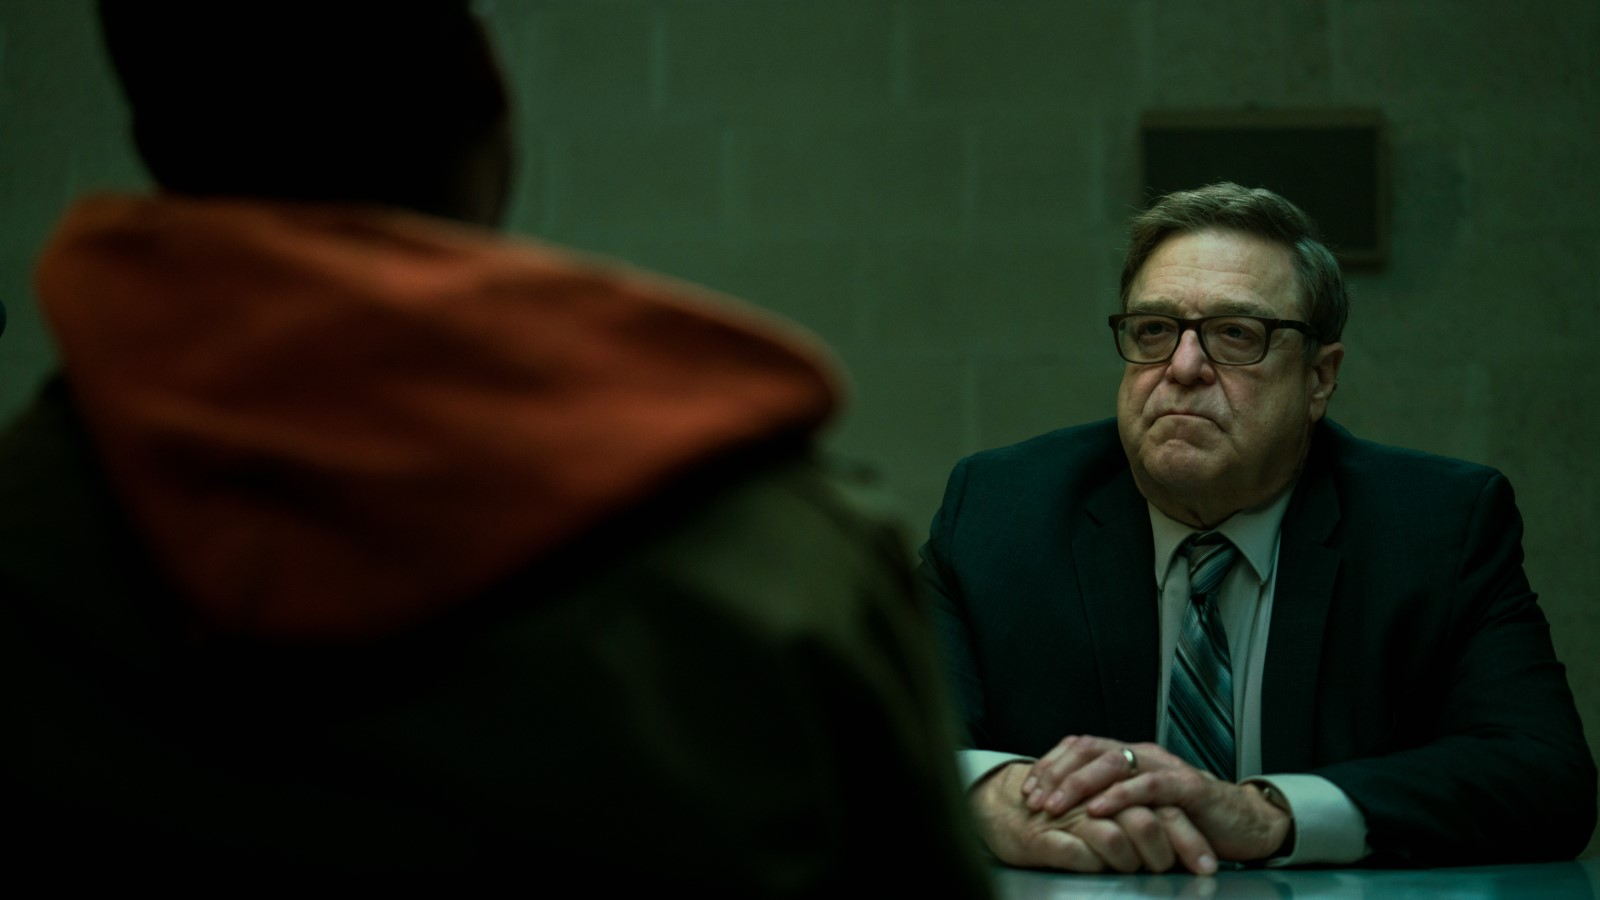 John Goodman in Captive State (2019)